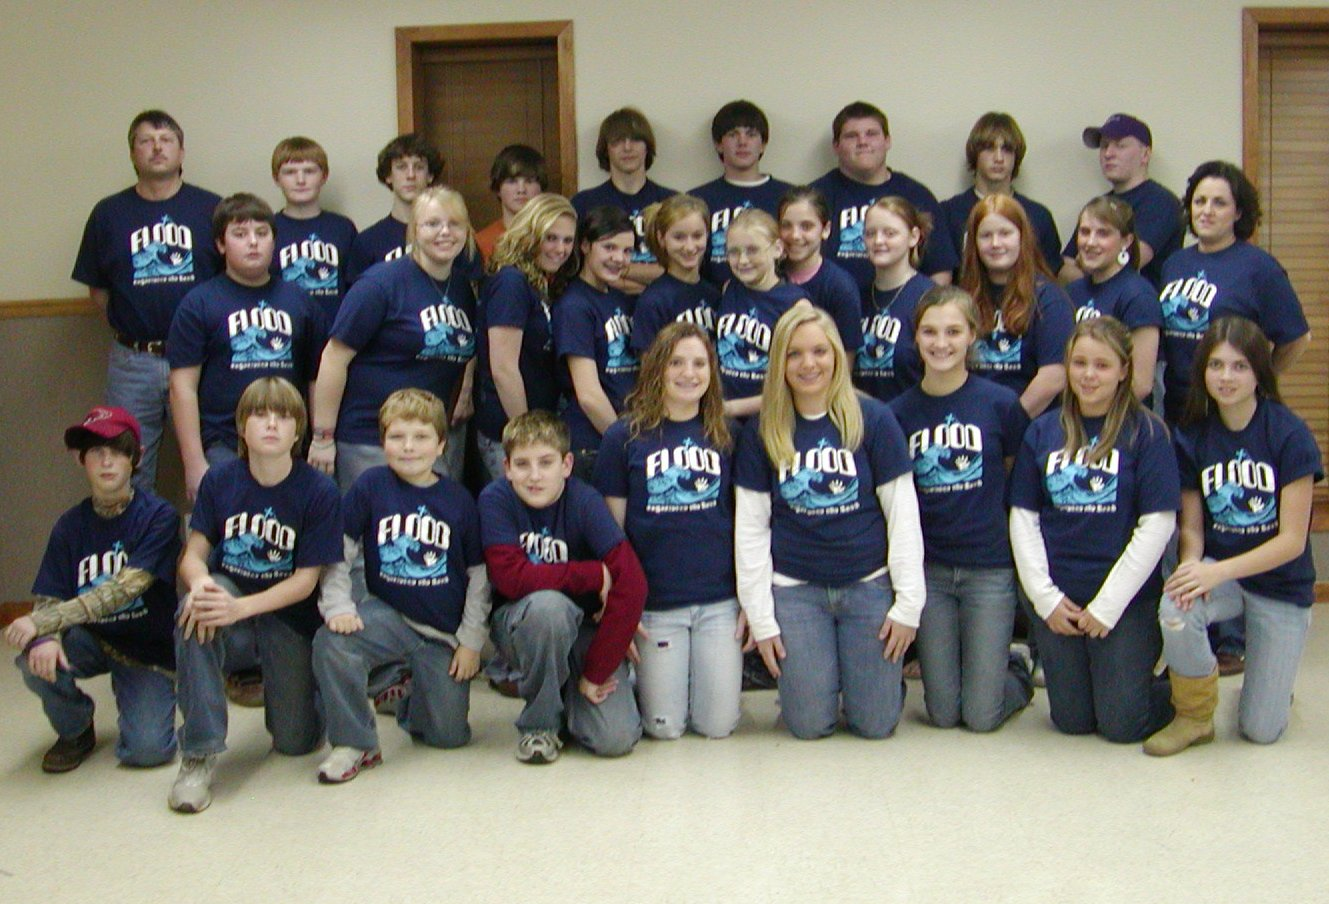 Design t shirt for group - Promise Land Mbc Junior Varsity Awana Class Of 2006 2007 T Shirt Photo